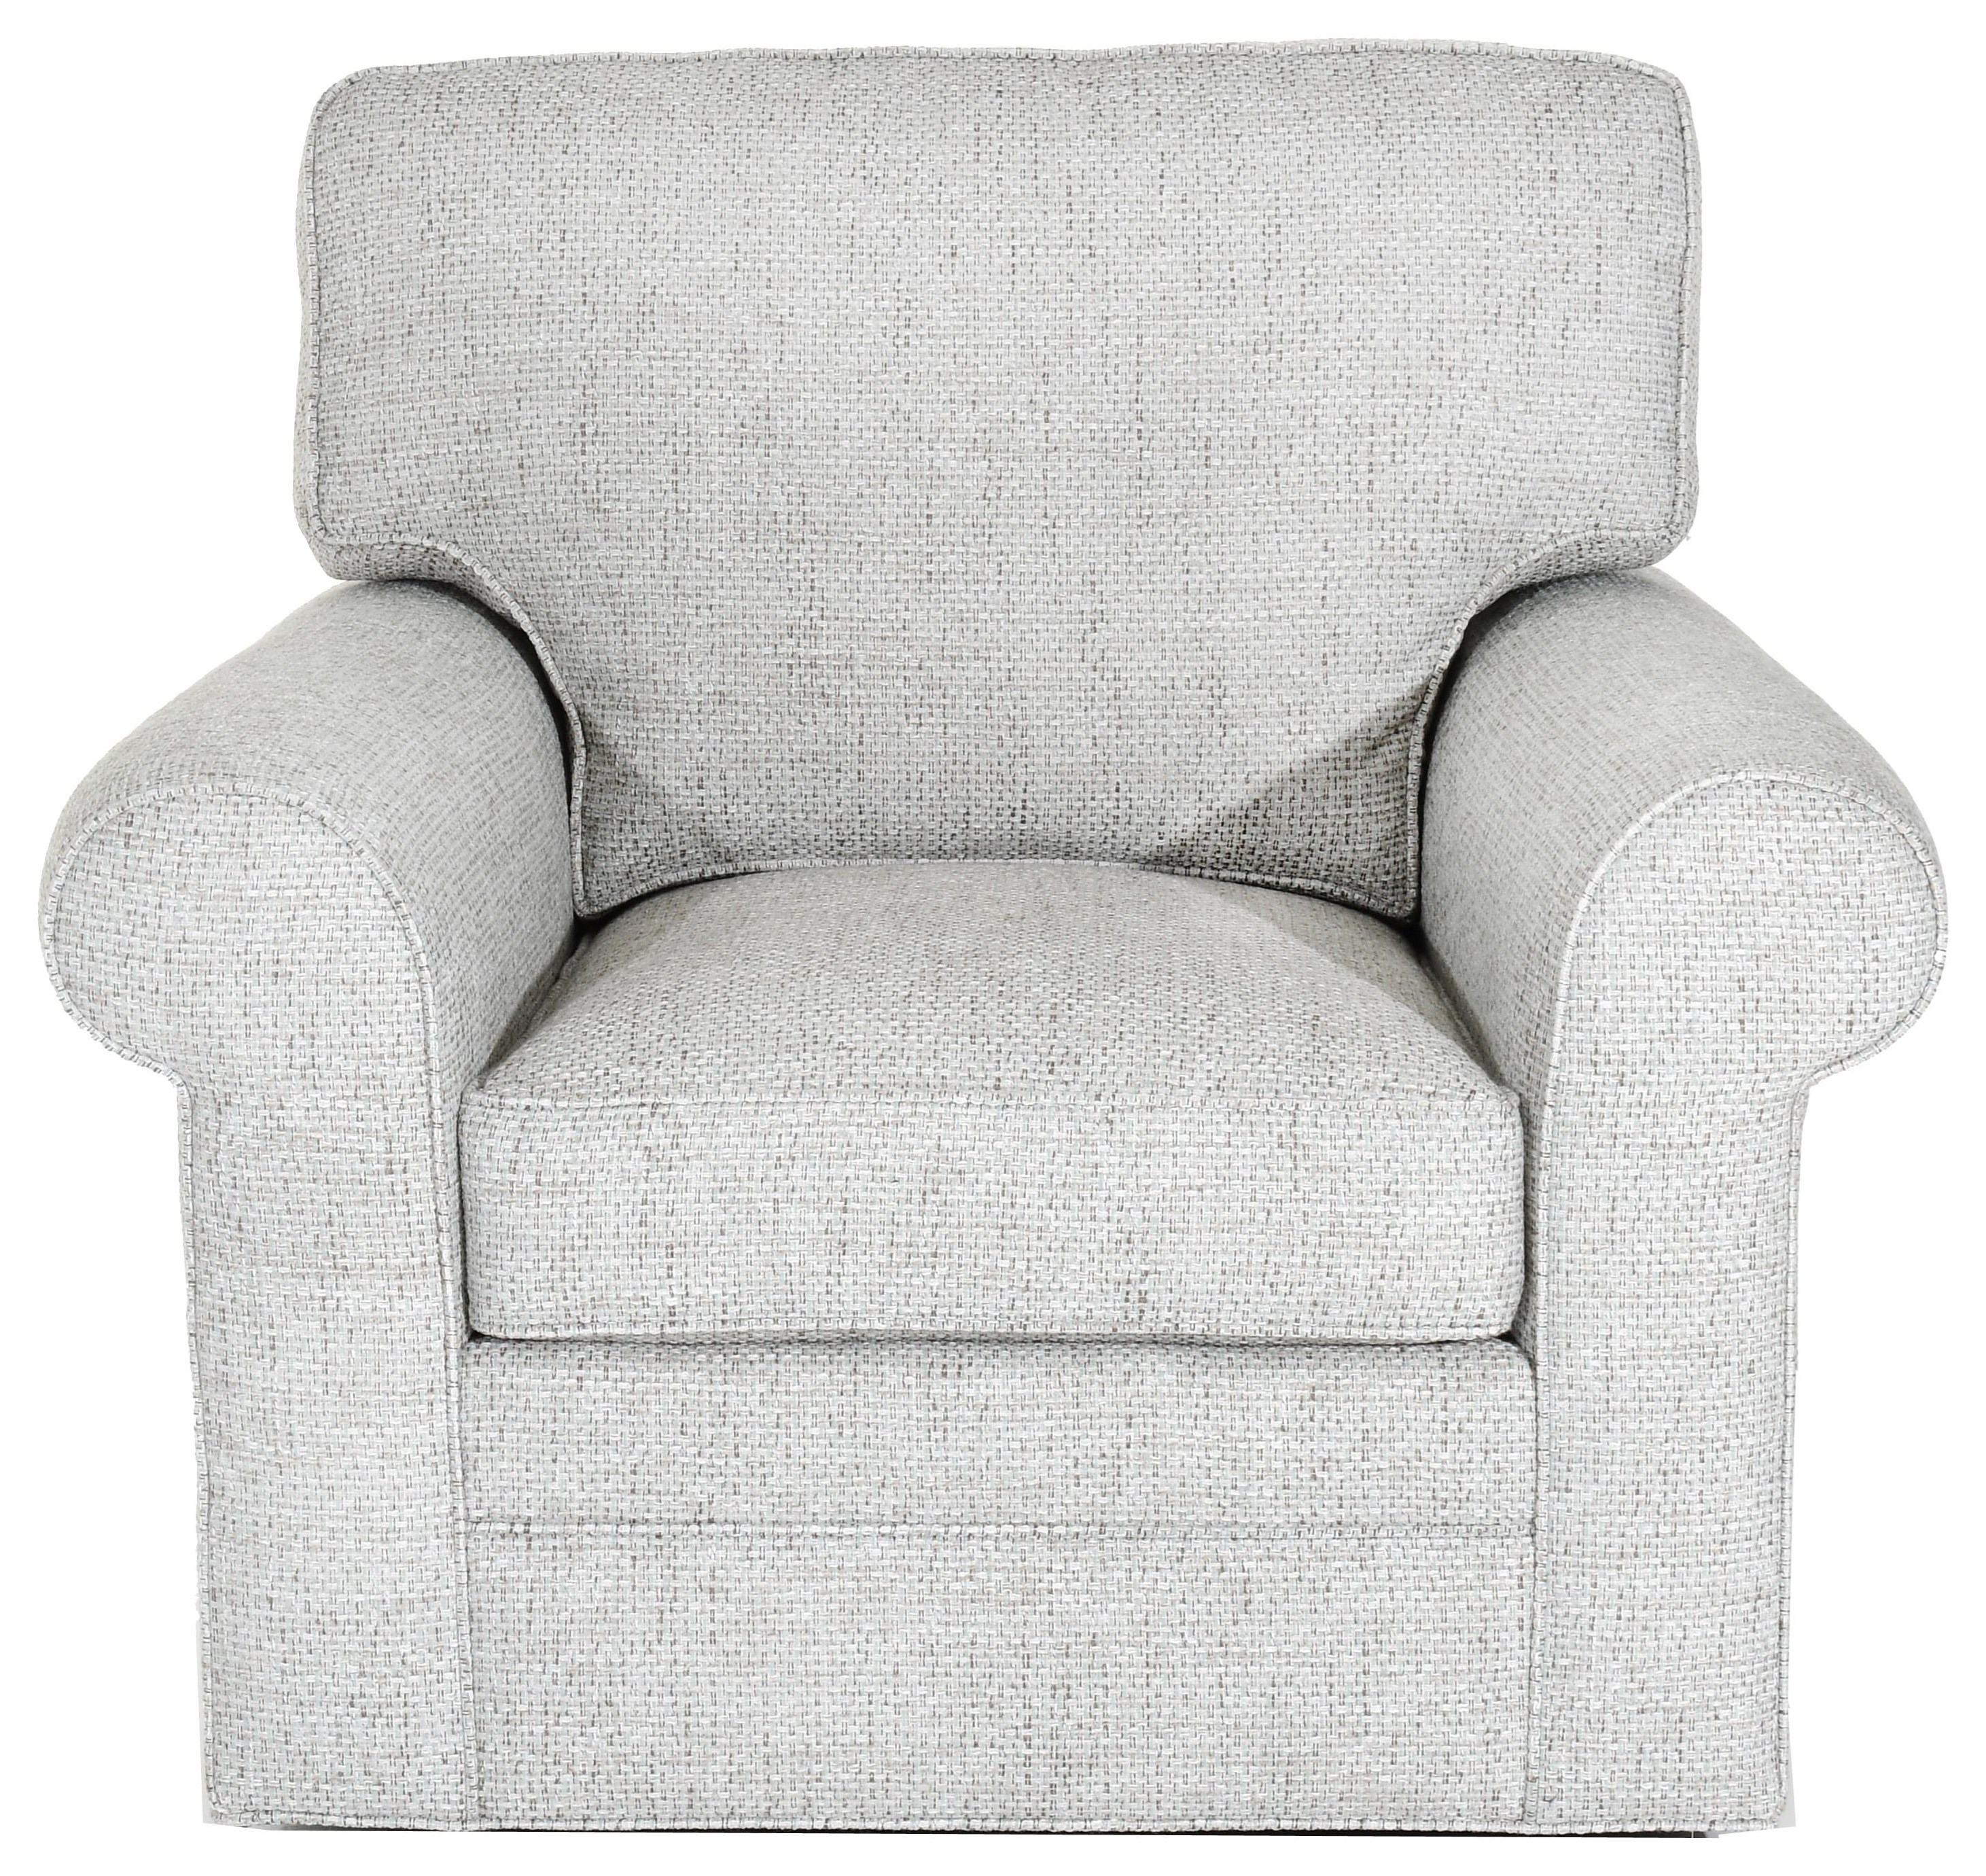 Sherrill Design Your OwnCustomizable Swivel Chair ...